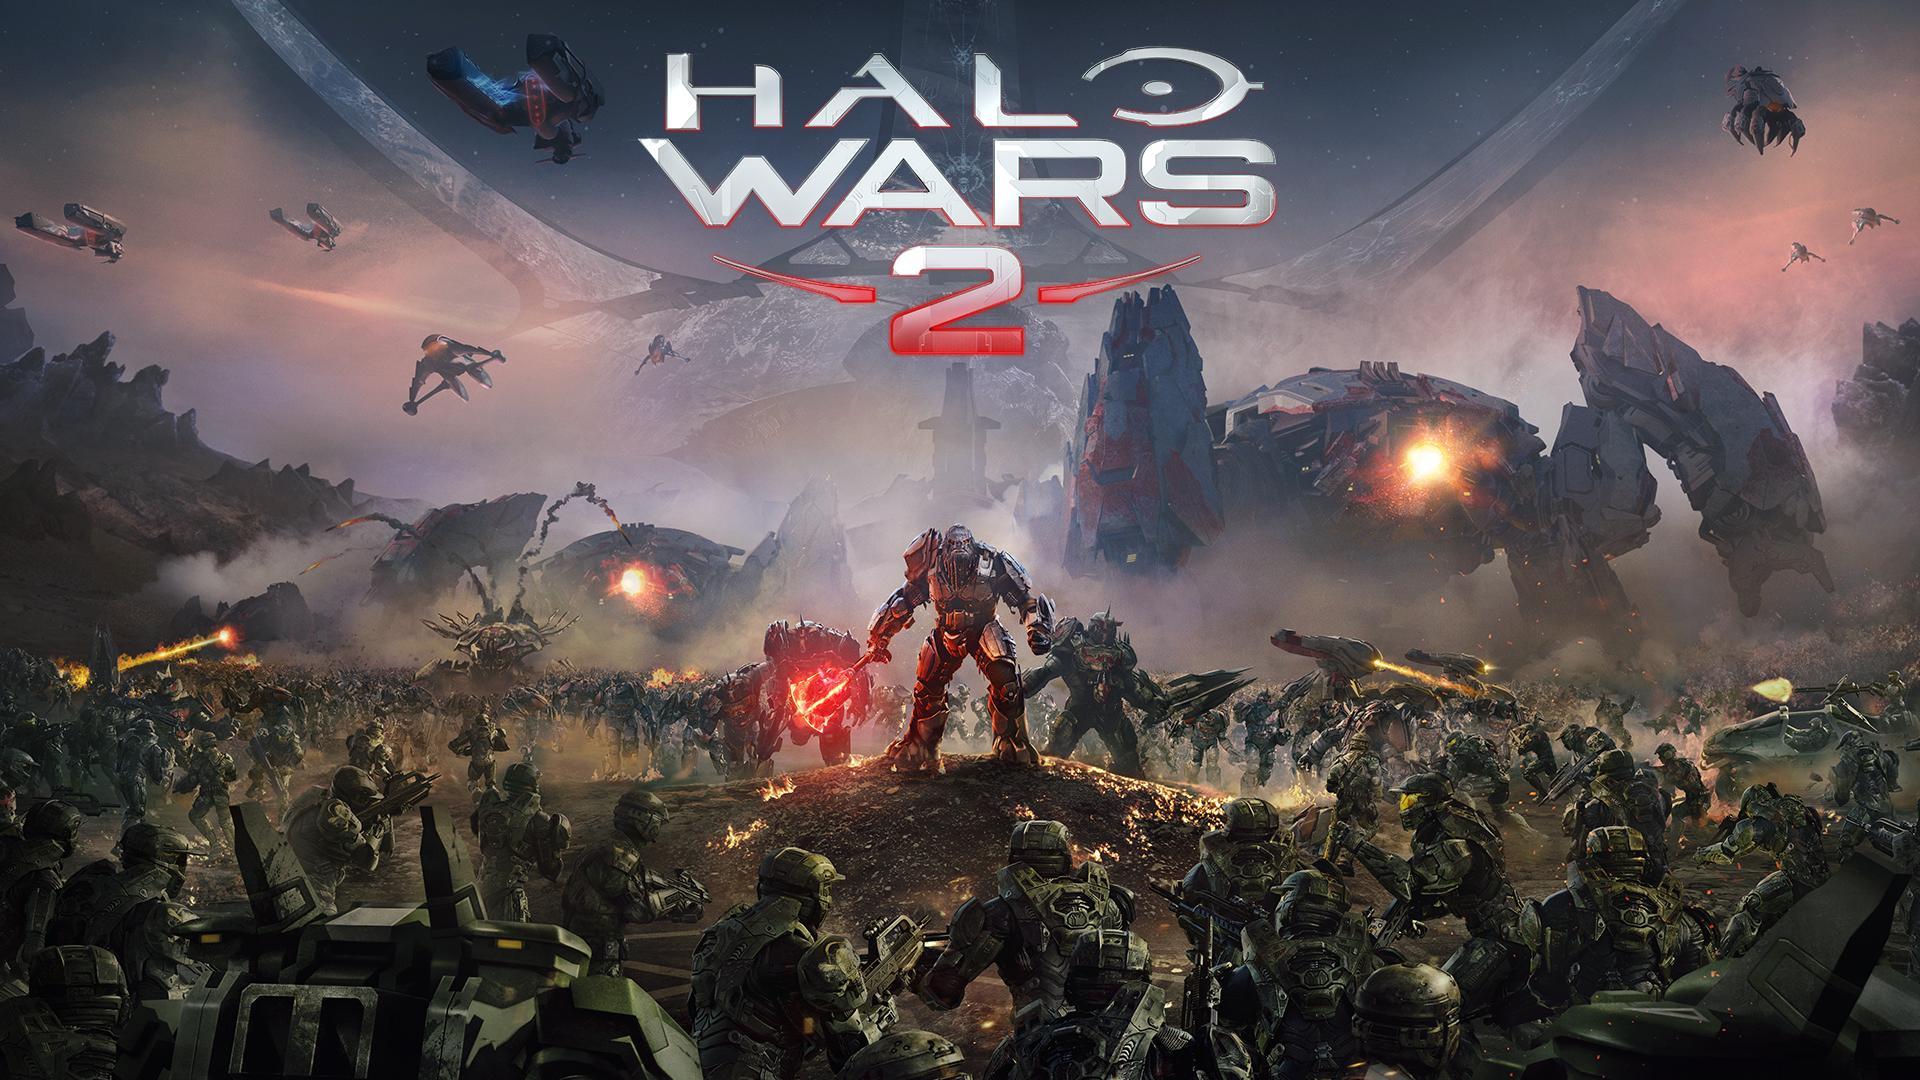 Halo Wars 2 - Wallpaper